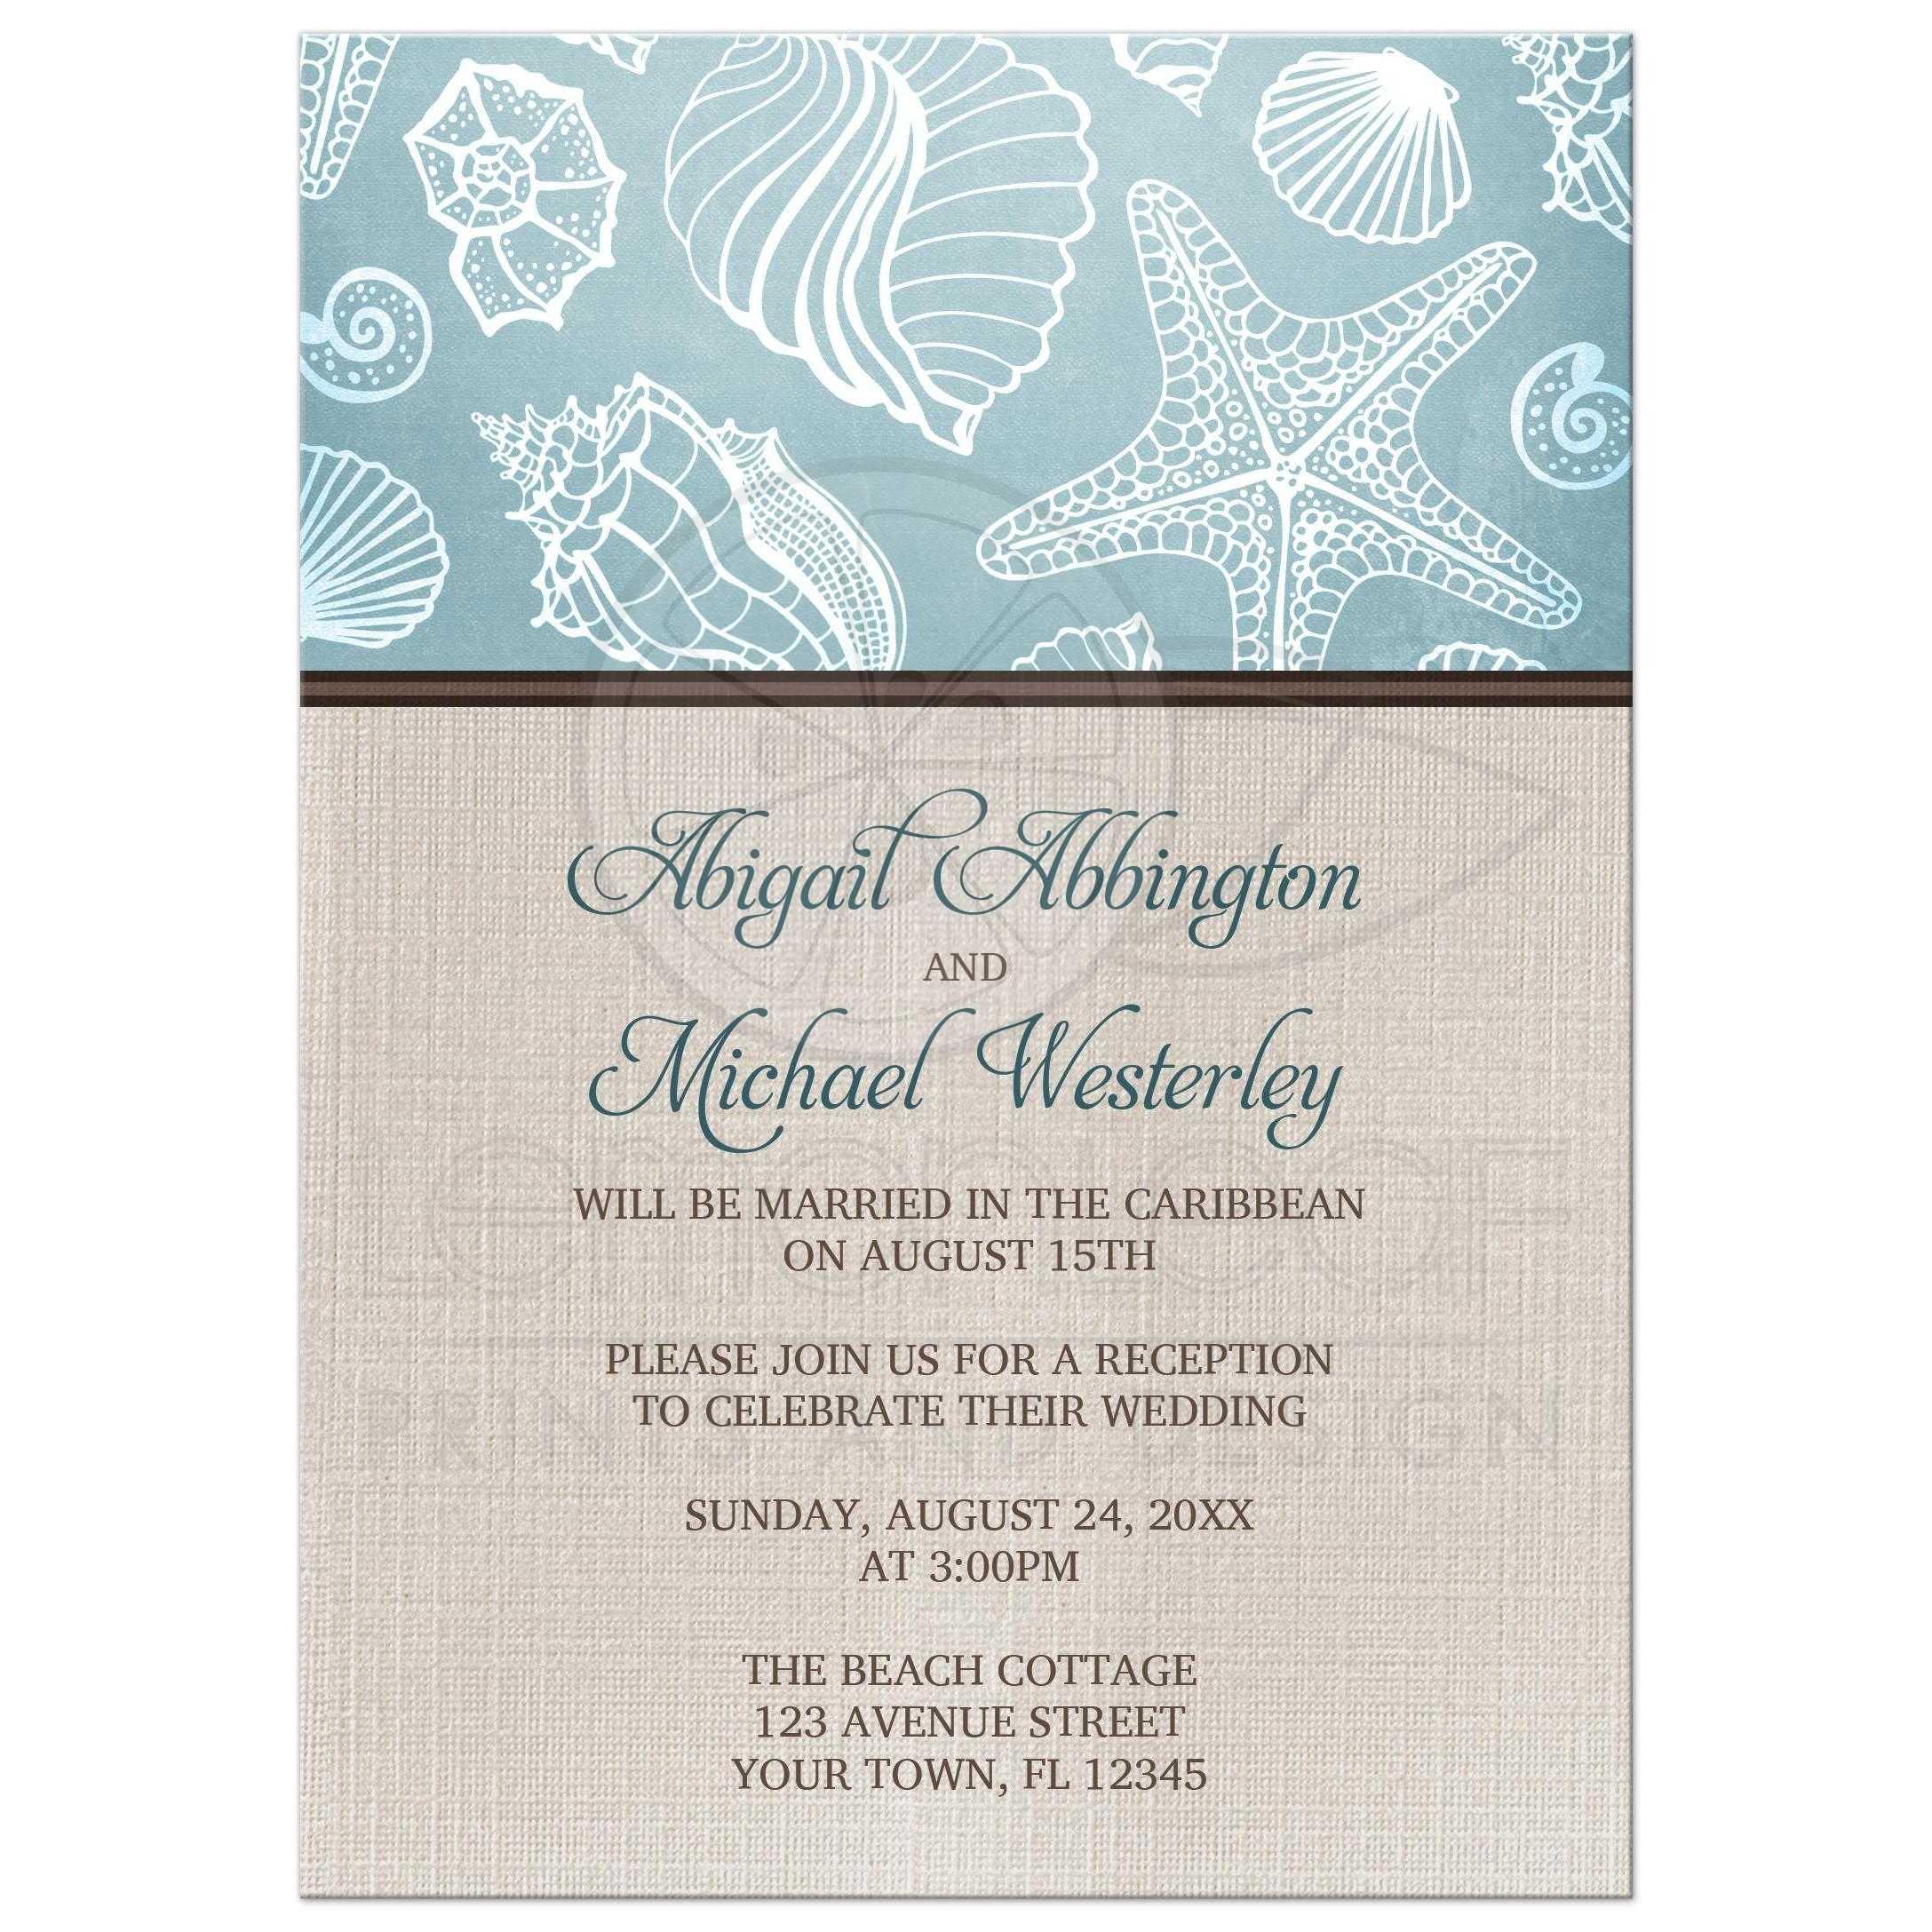 wedding invitation reception only etiquette reception only wedding invitations Wedding Invitations Wording Reception Only